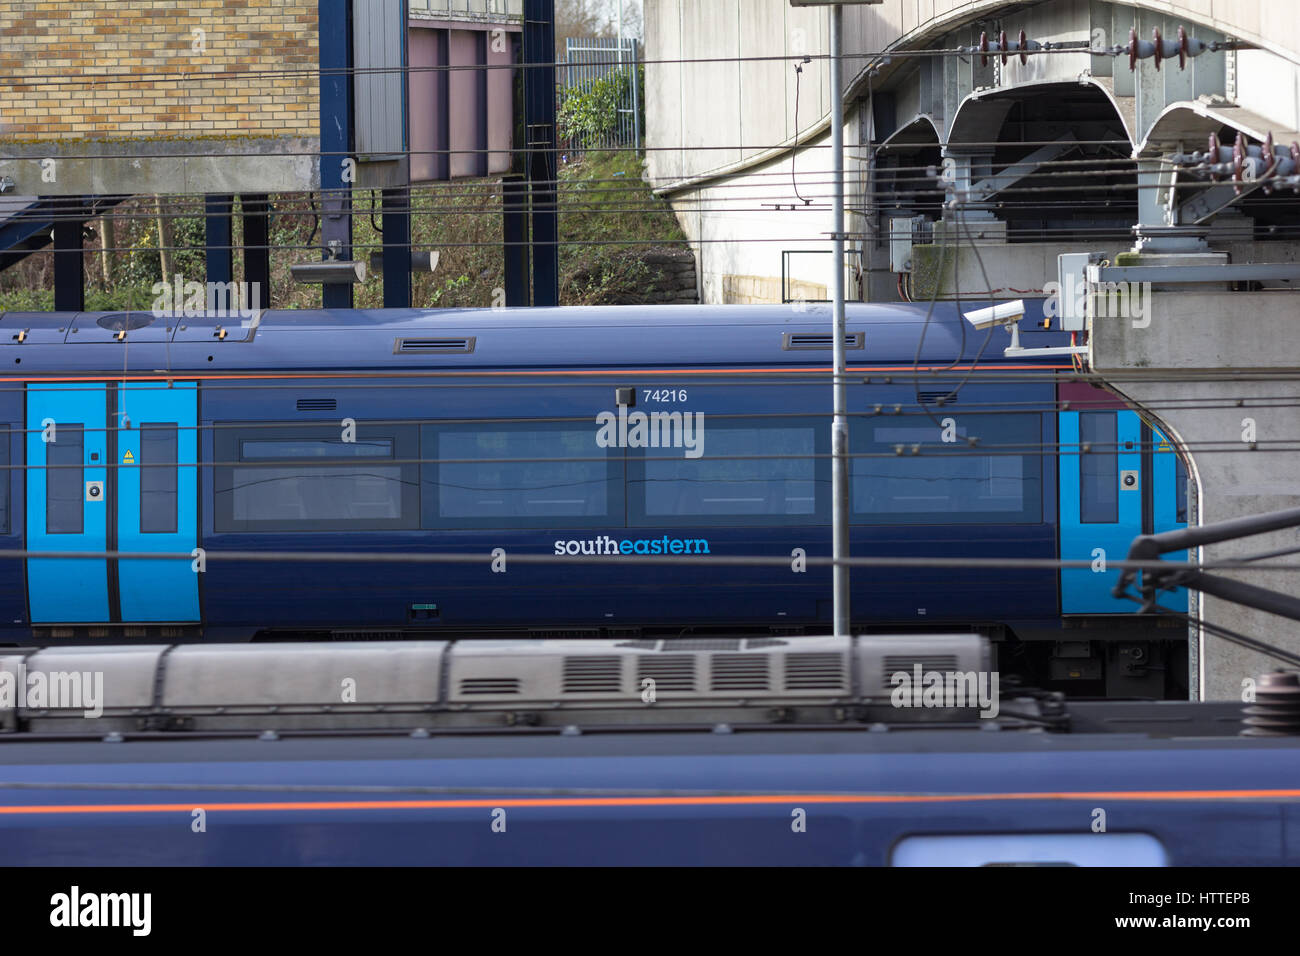 Ashford international train station and southeastern train. Ashford, Kent - Stock Image